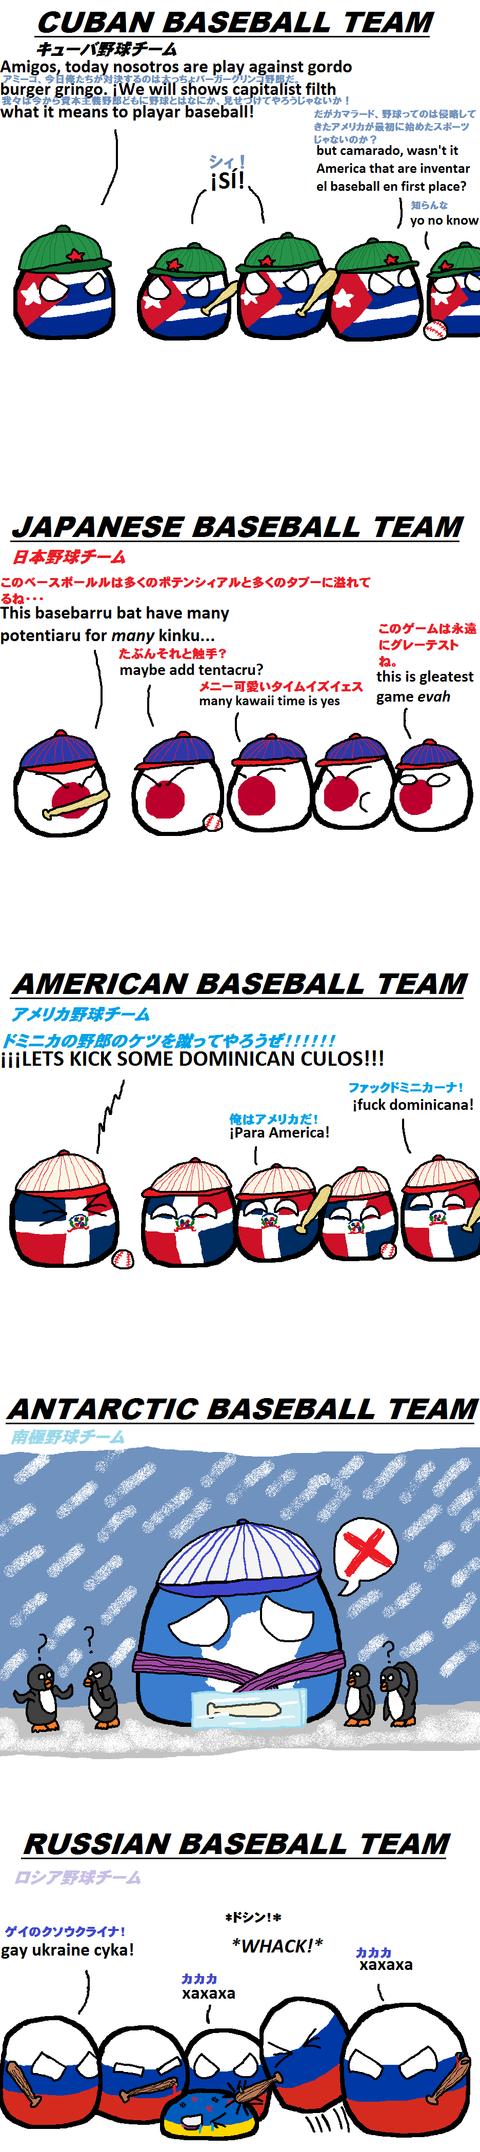 Baseball Teams Around the World